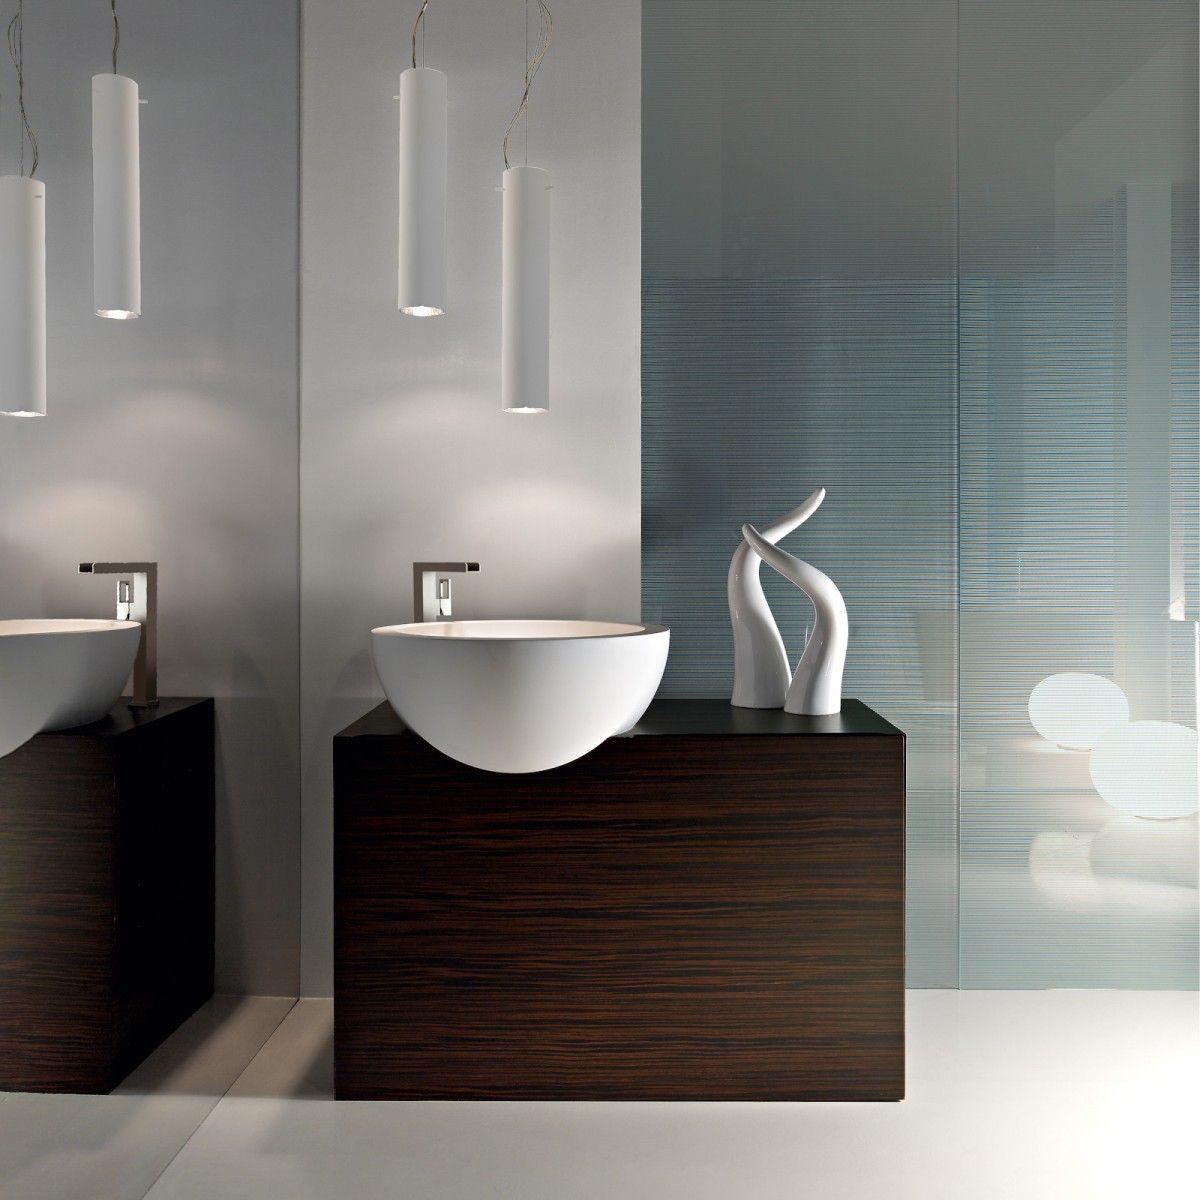 Ultra Modern Italian Bathroom Design Deco Salle De Bain Toilette Meuble Sous Lavabo Vasque Salle De Bain